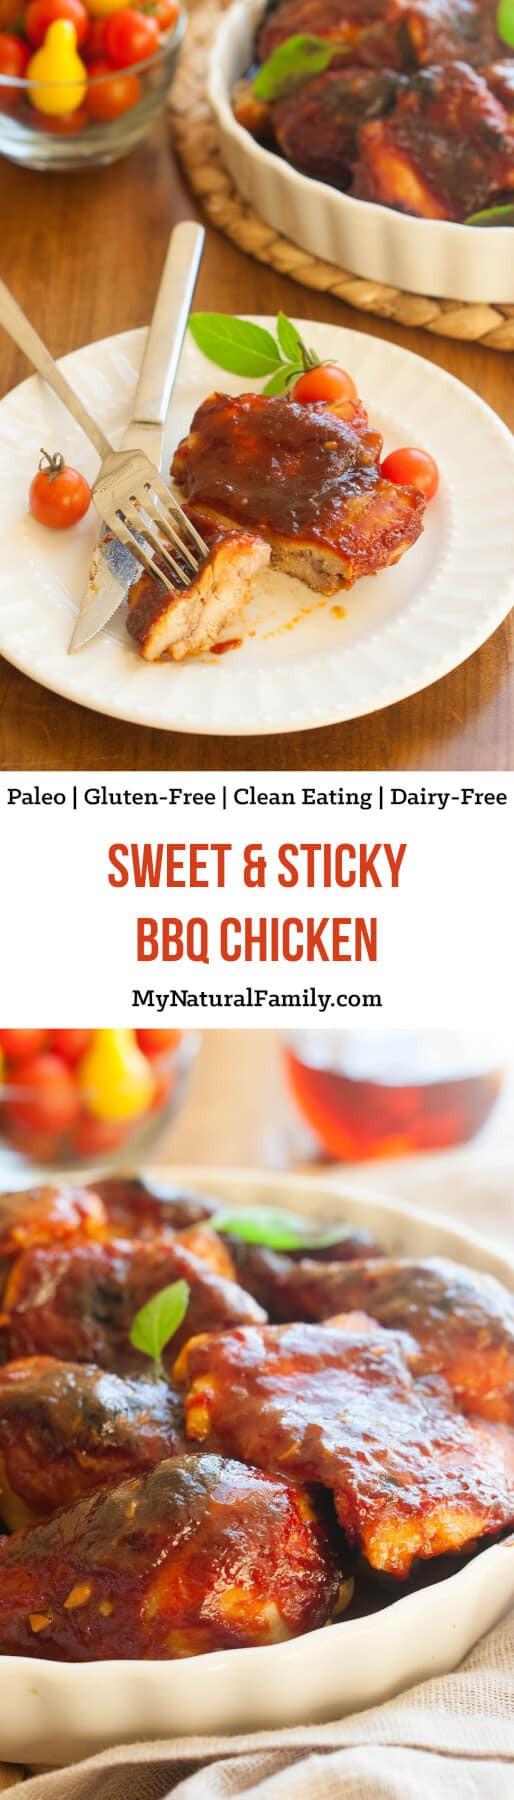 Easy Gluten Free Chicken Recipes  25 Easy Gluten Free Chicken Recipes for a Month